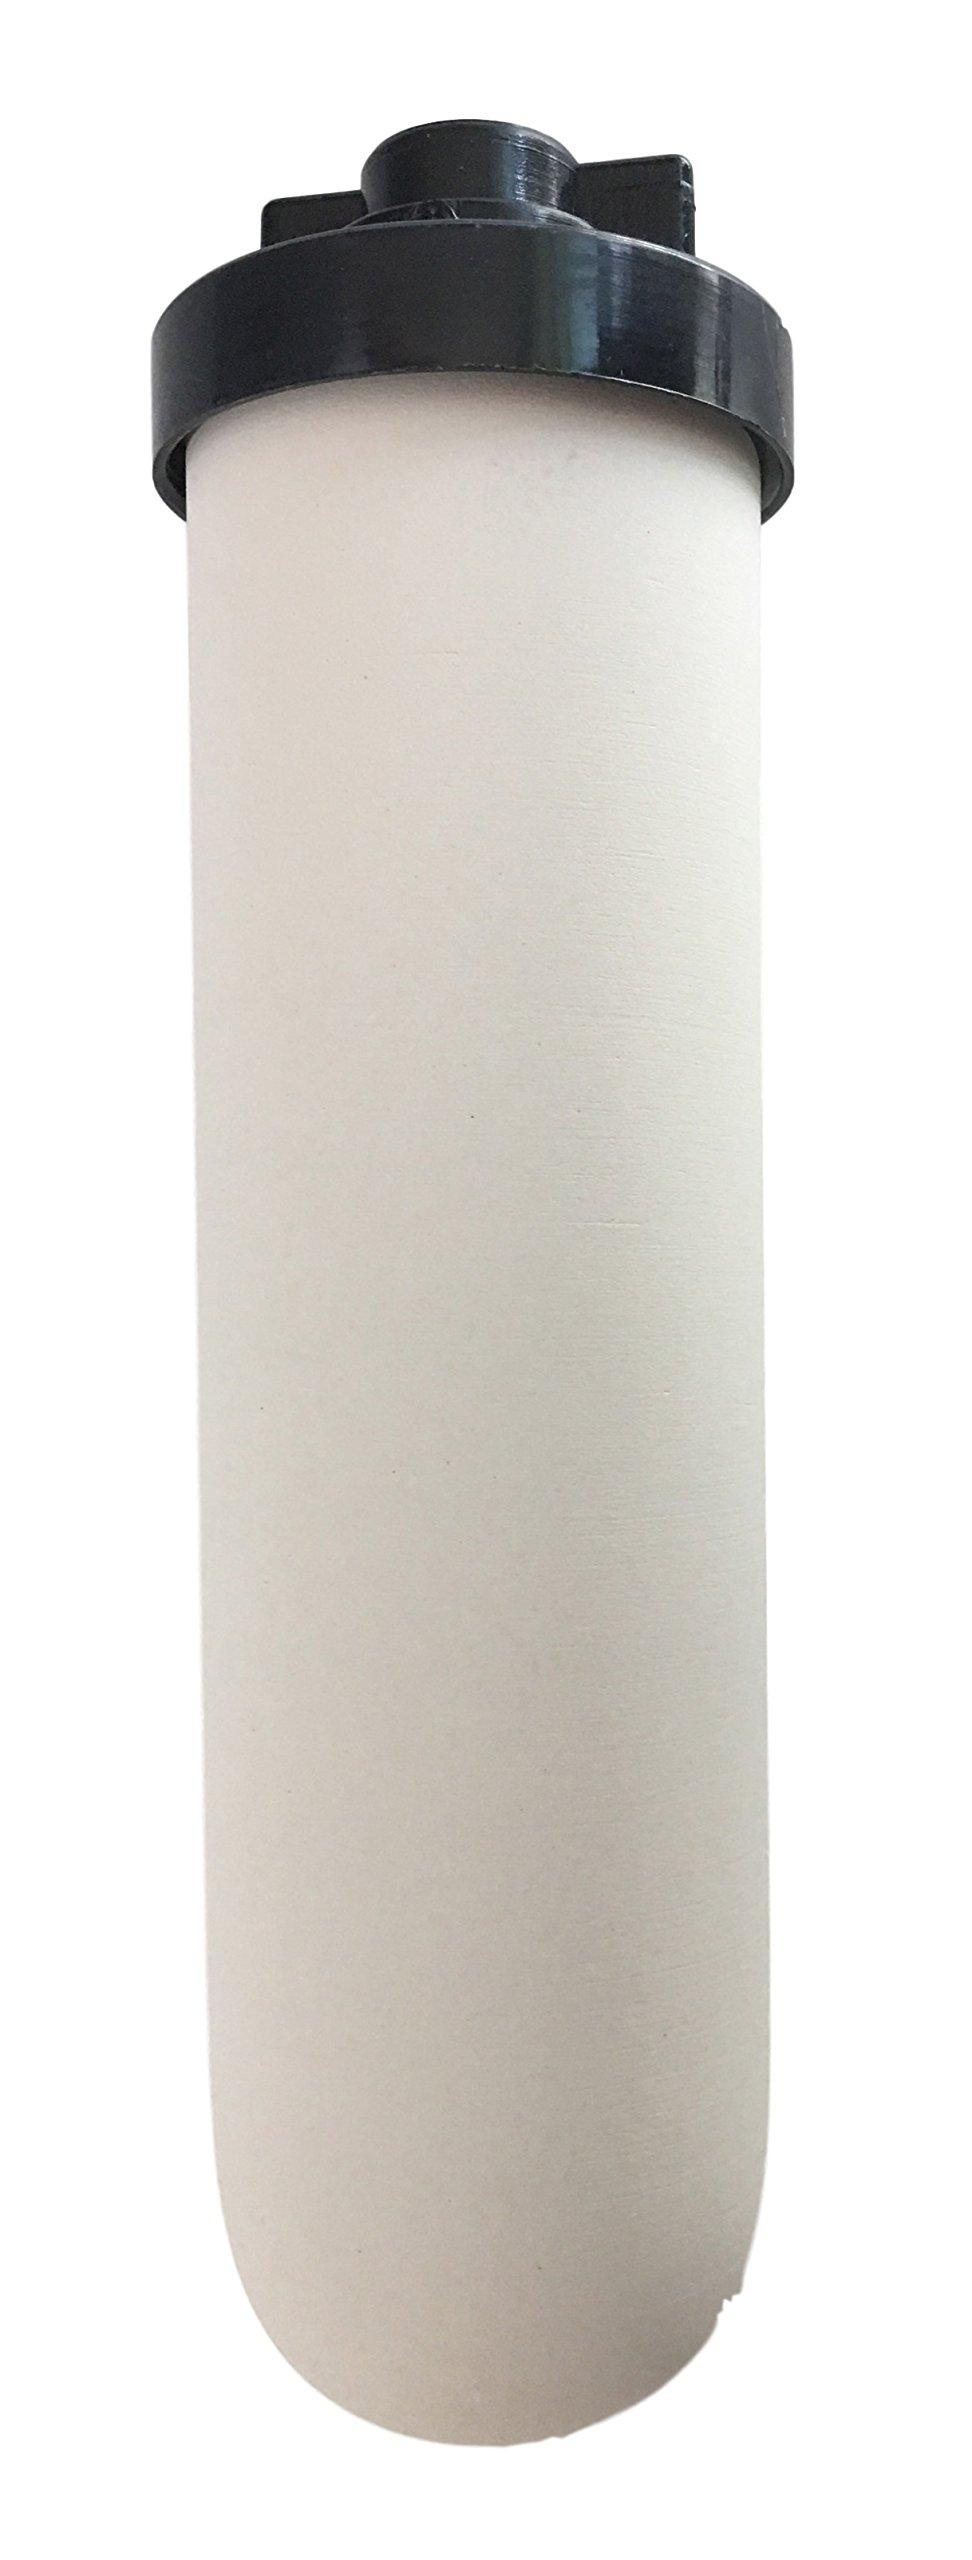 Aquacera CeraPlus Chlorine, Taste & Odor Reduction 7 inch Gravity Feed Replacement Cartridge